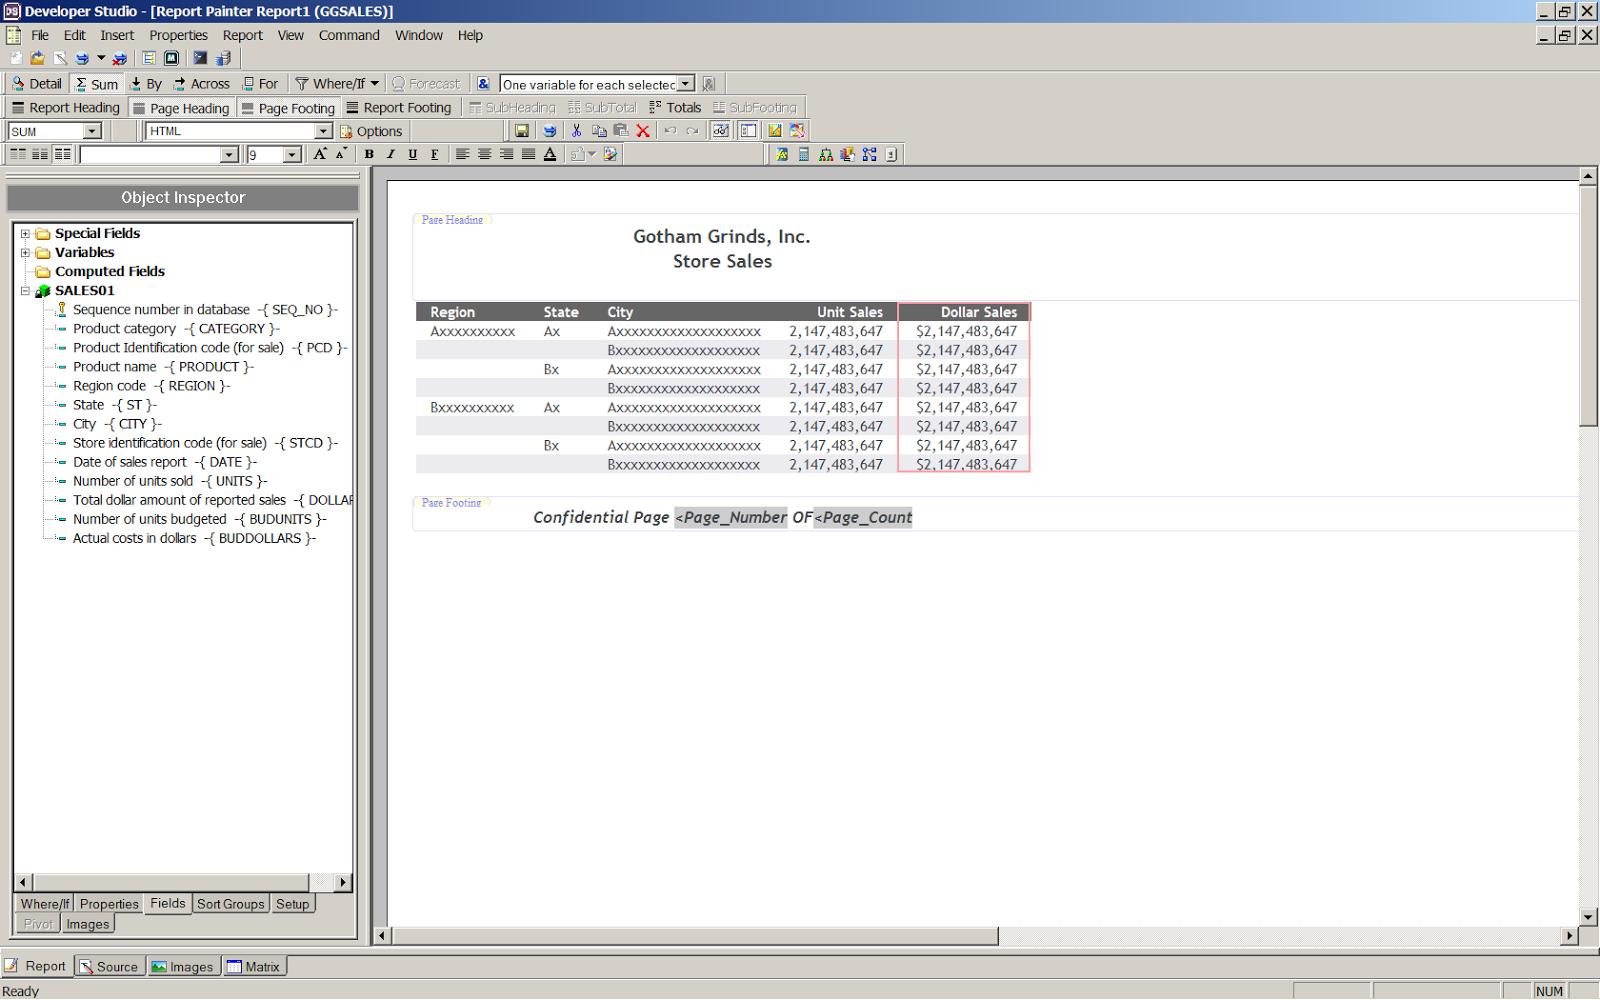 Developer+Studio+IDE Developing BI/BA Web and Mobile Applications with WebFOCUS